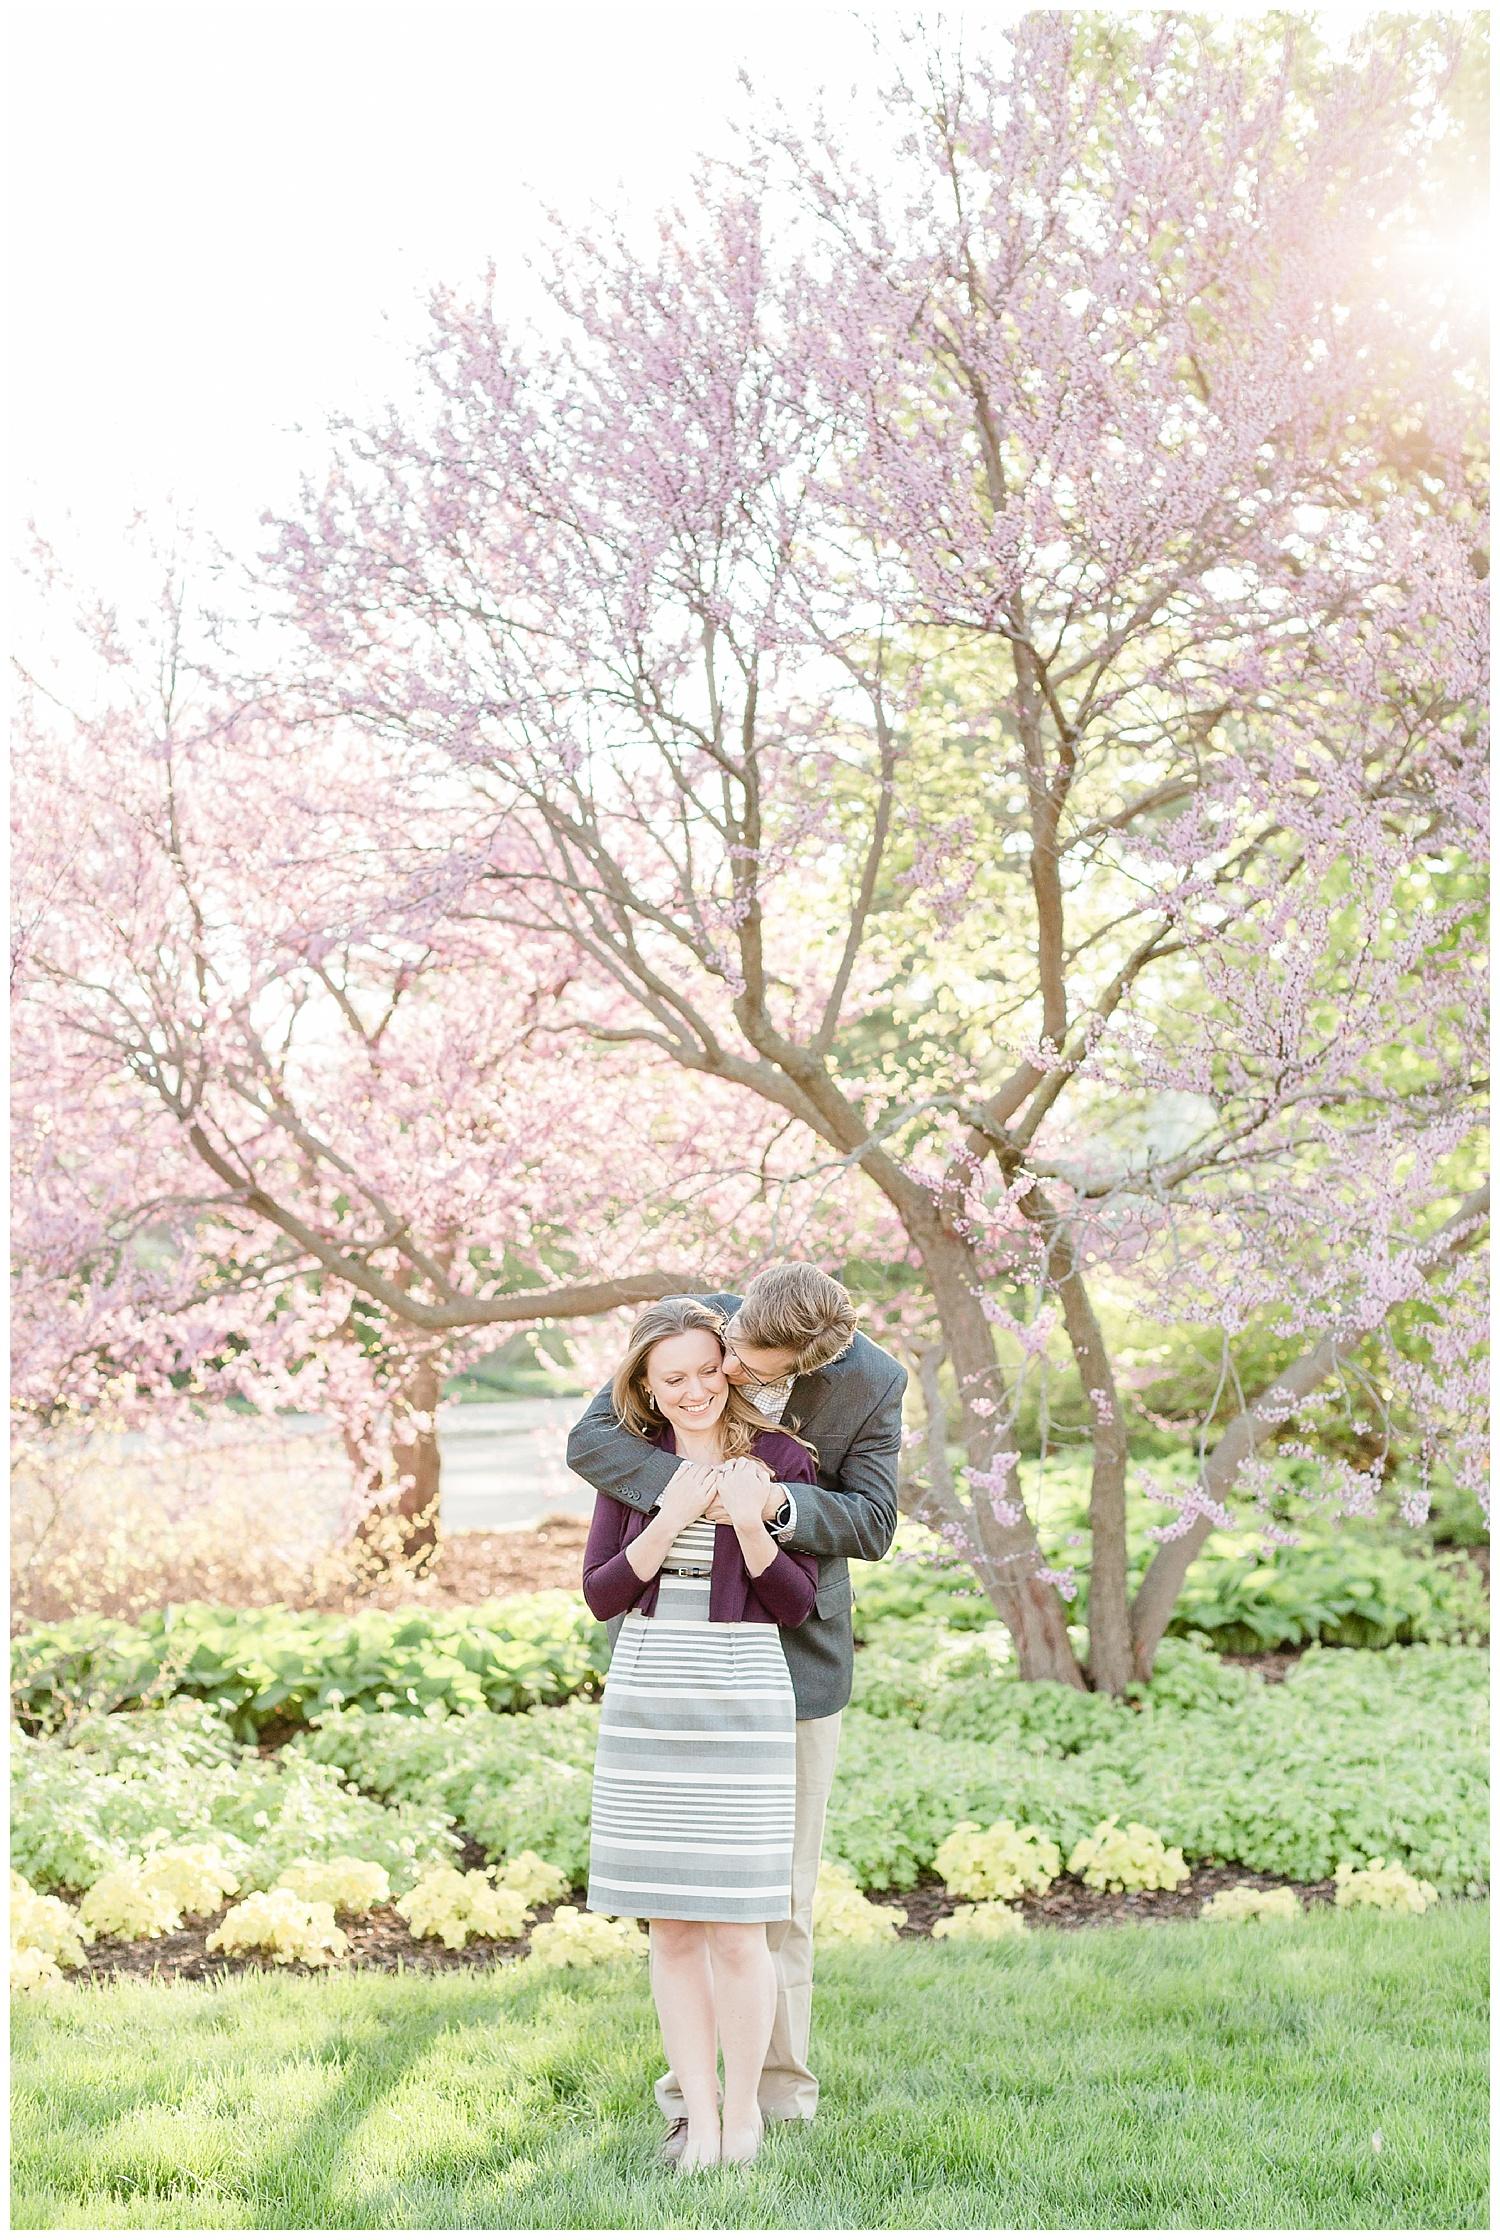 morton-arboretum-lisle-wedding-photographer-summer-engagement-session_0001.jpg